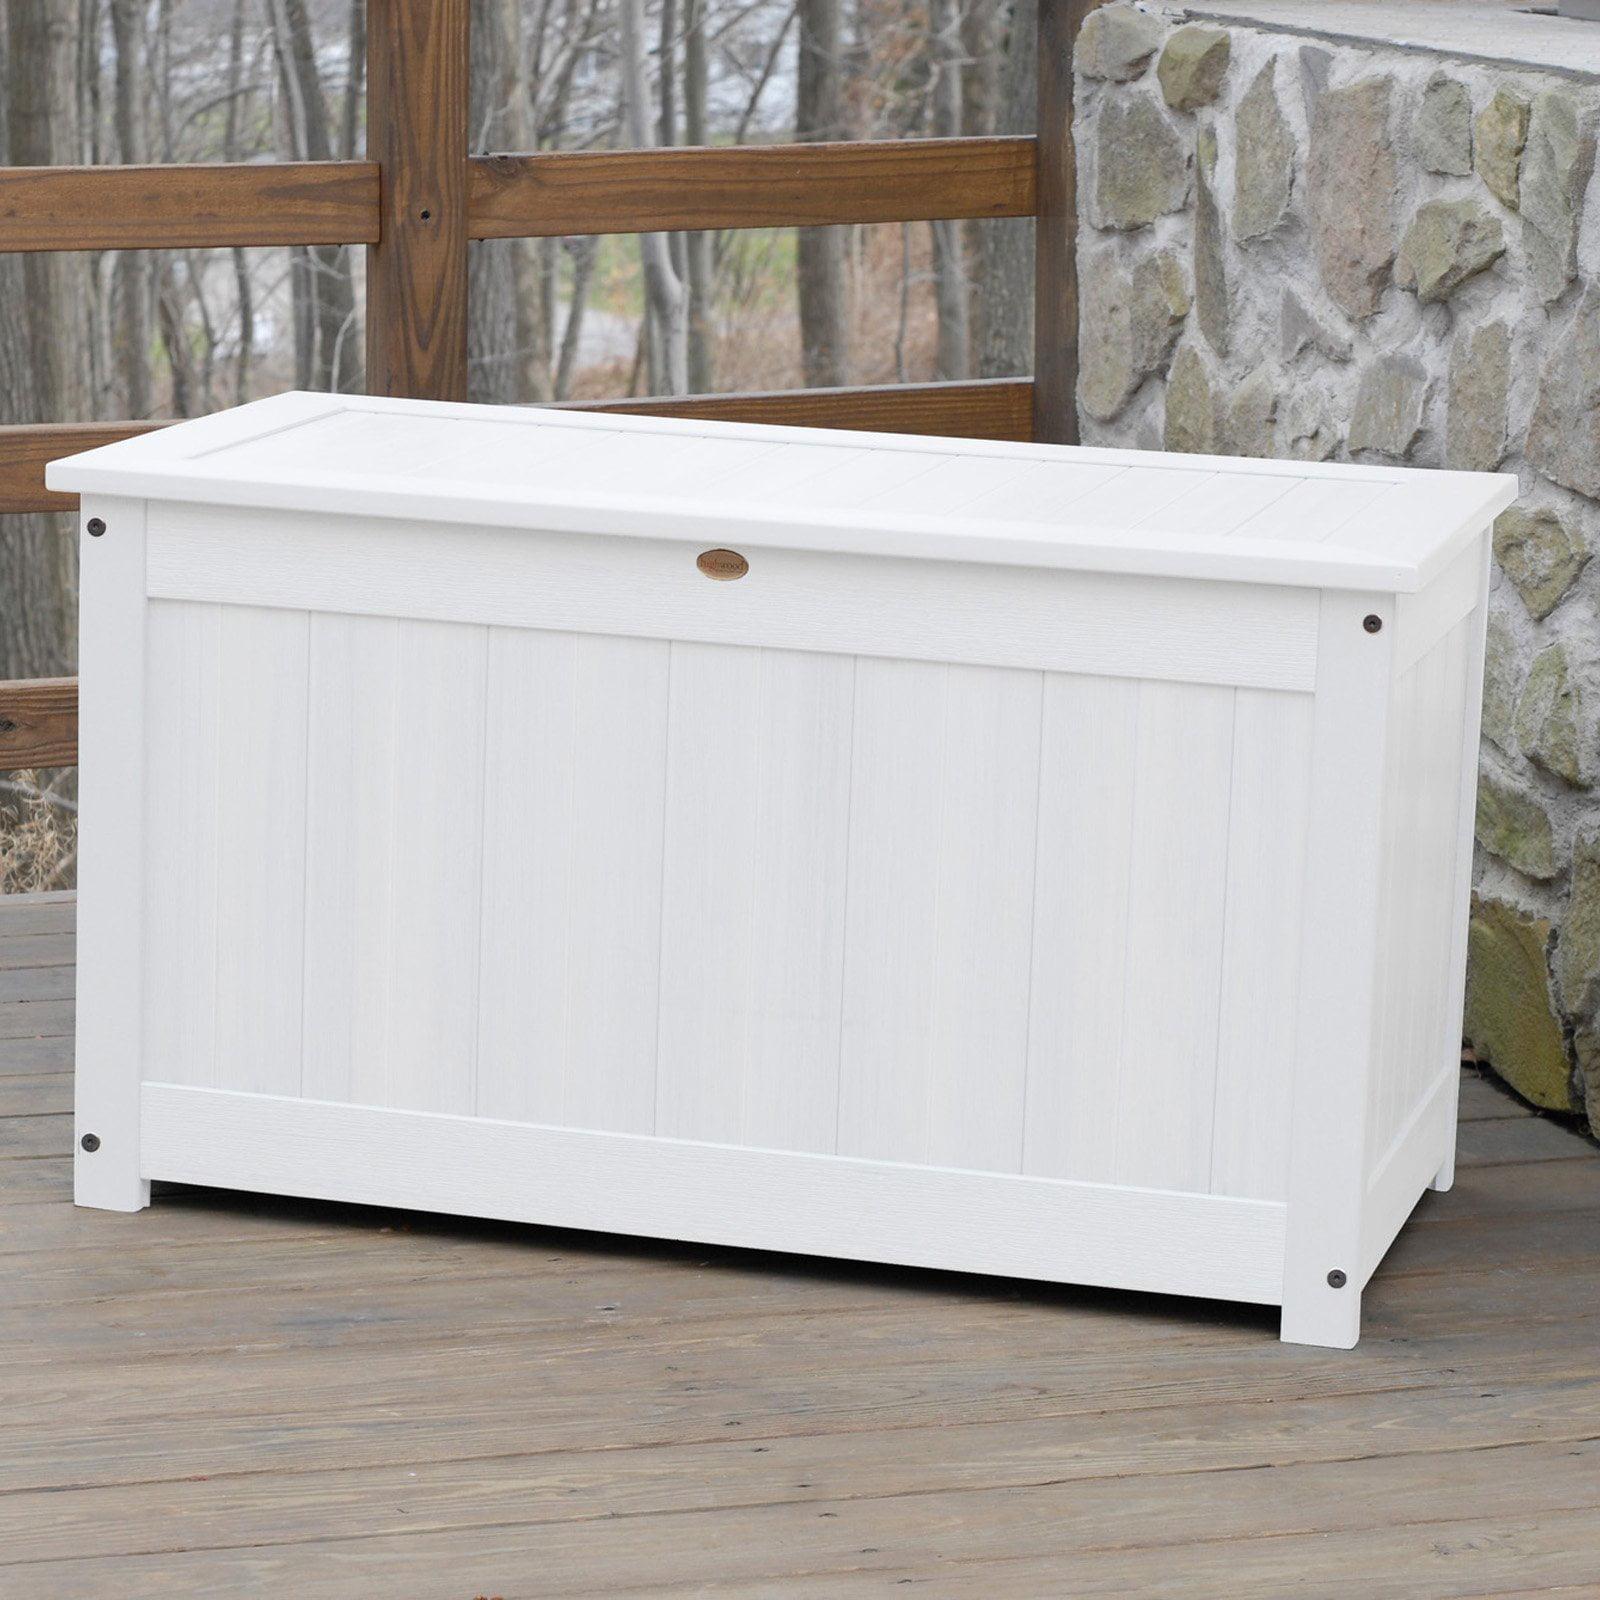 Highwood 42 In Large Recycled Plastic 100 Gallon Deck Storage Box Walmart Com Walmart Com